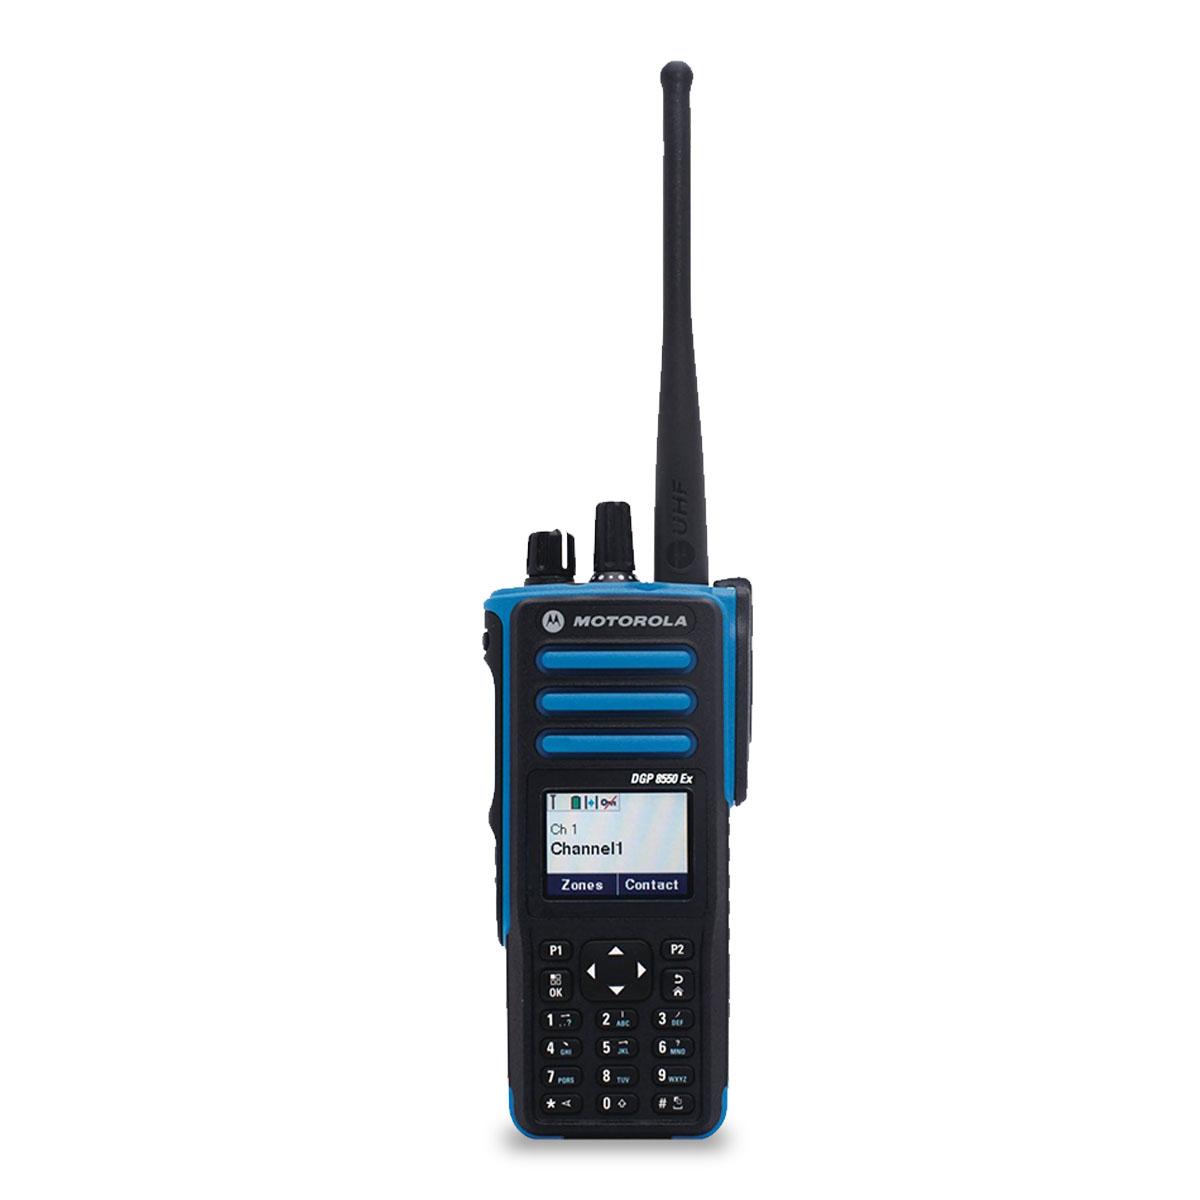 Radio Motorola DGP8550EX Digital